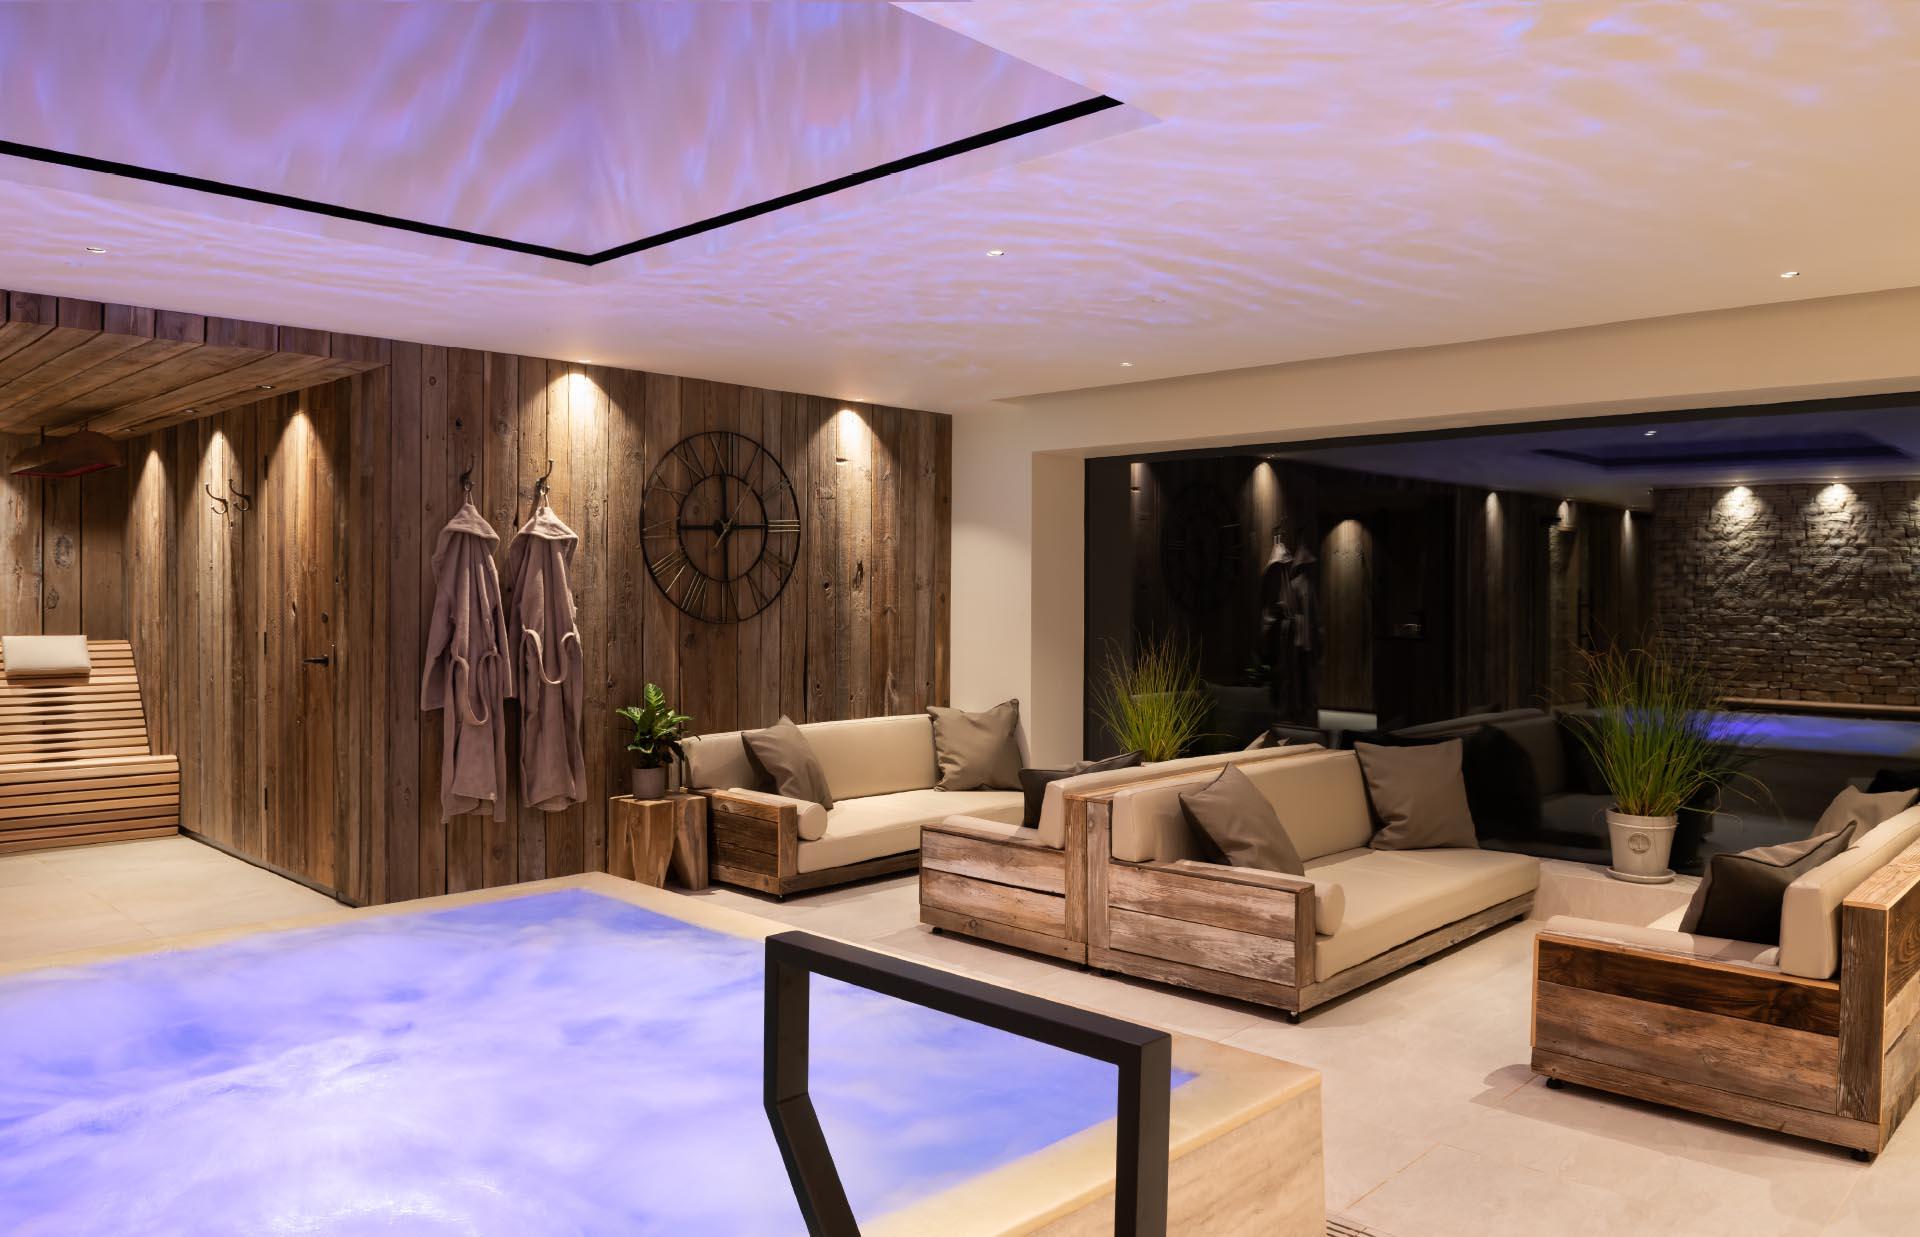 Homefield-Grange-Butterscotch-Spa-designers-Farmhouse-wellness-spa